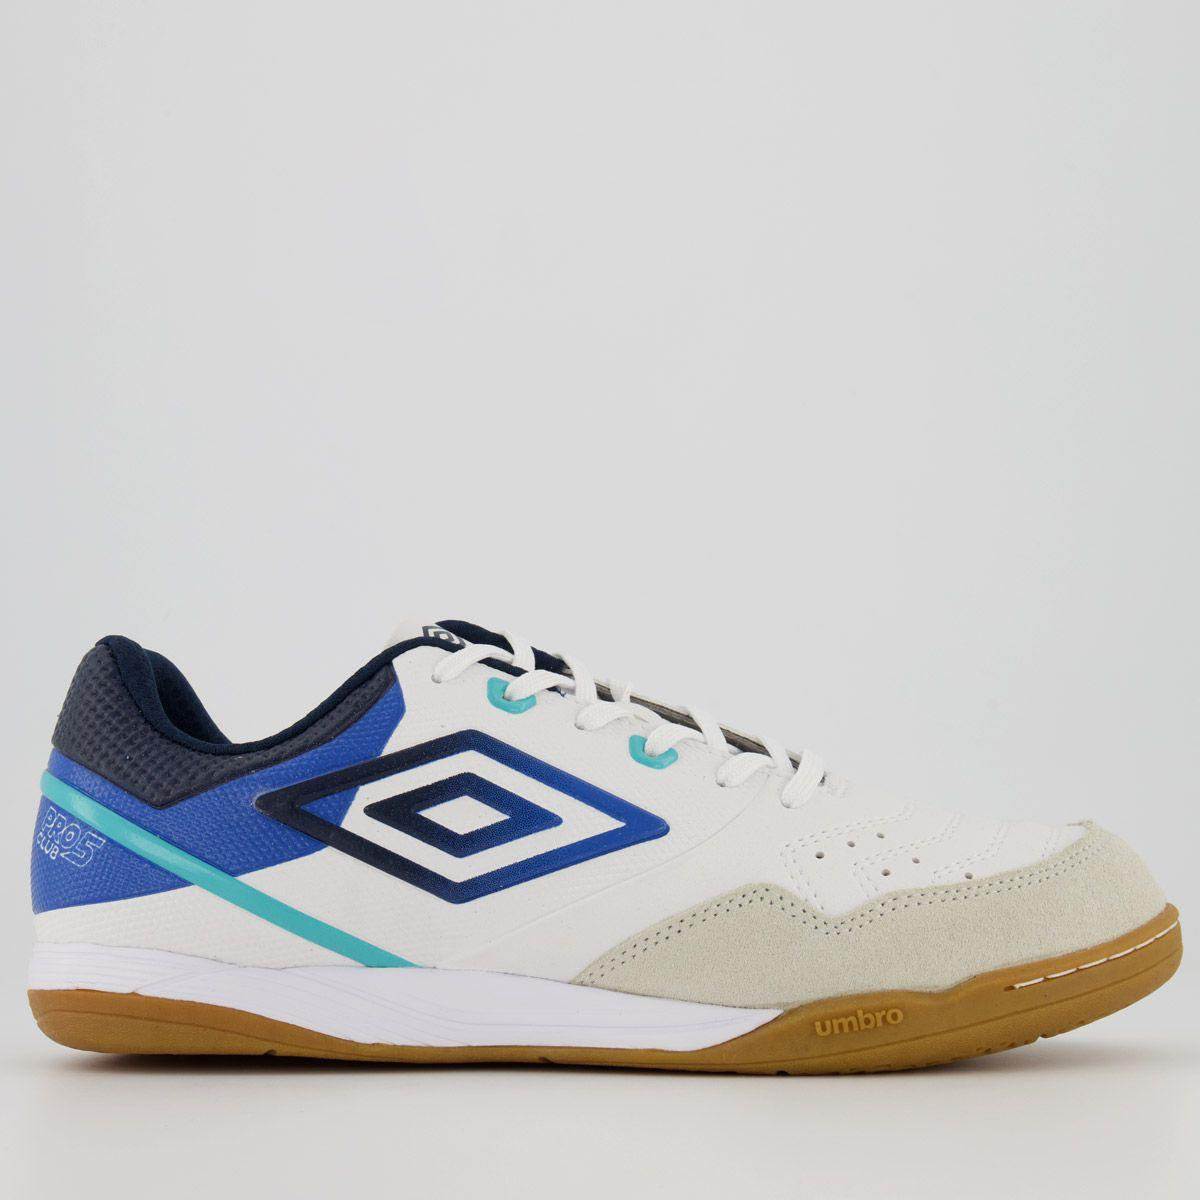 Tenis de Futsal Umbro Pró V Club